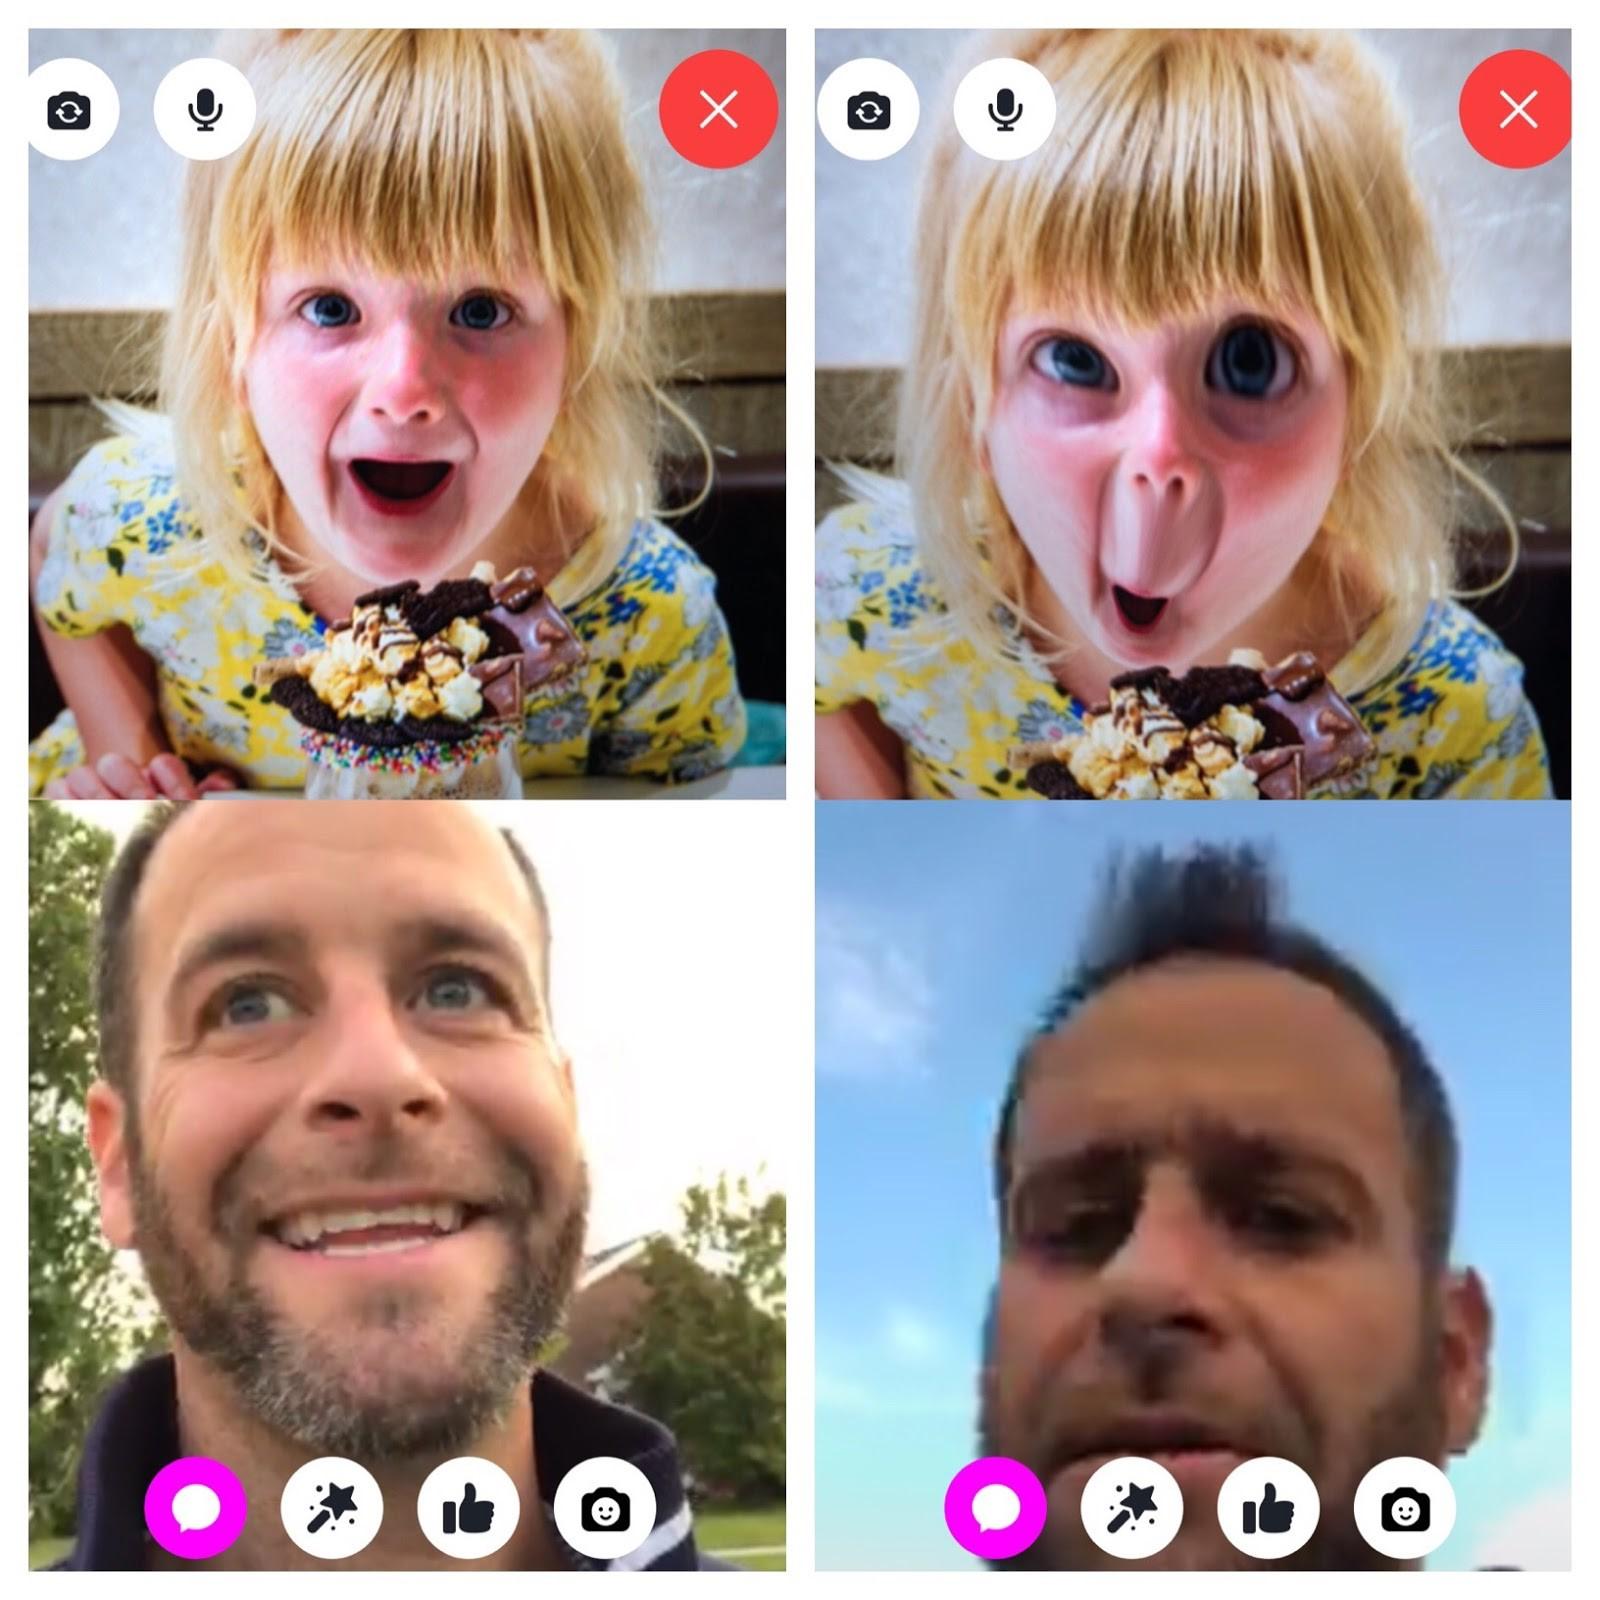 Using FB messenger kids app